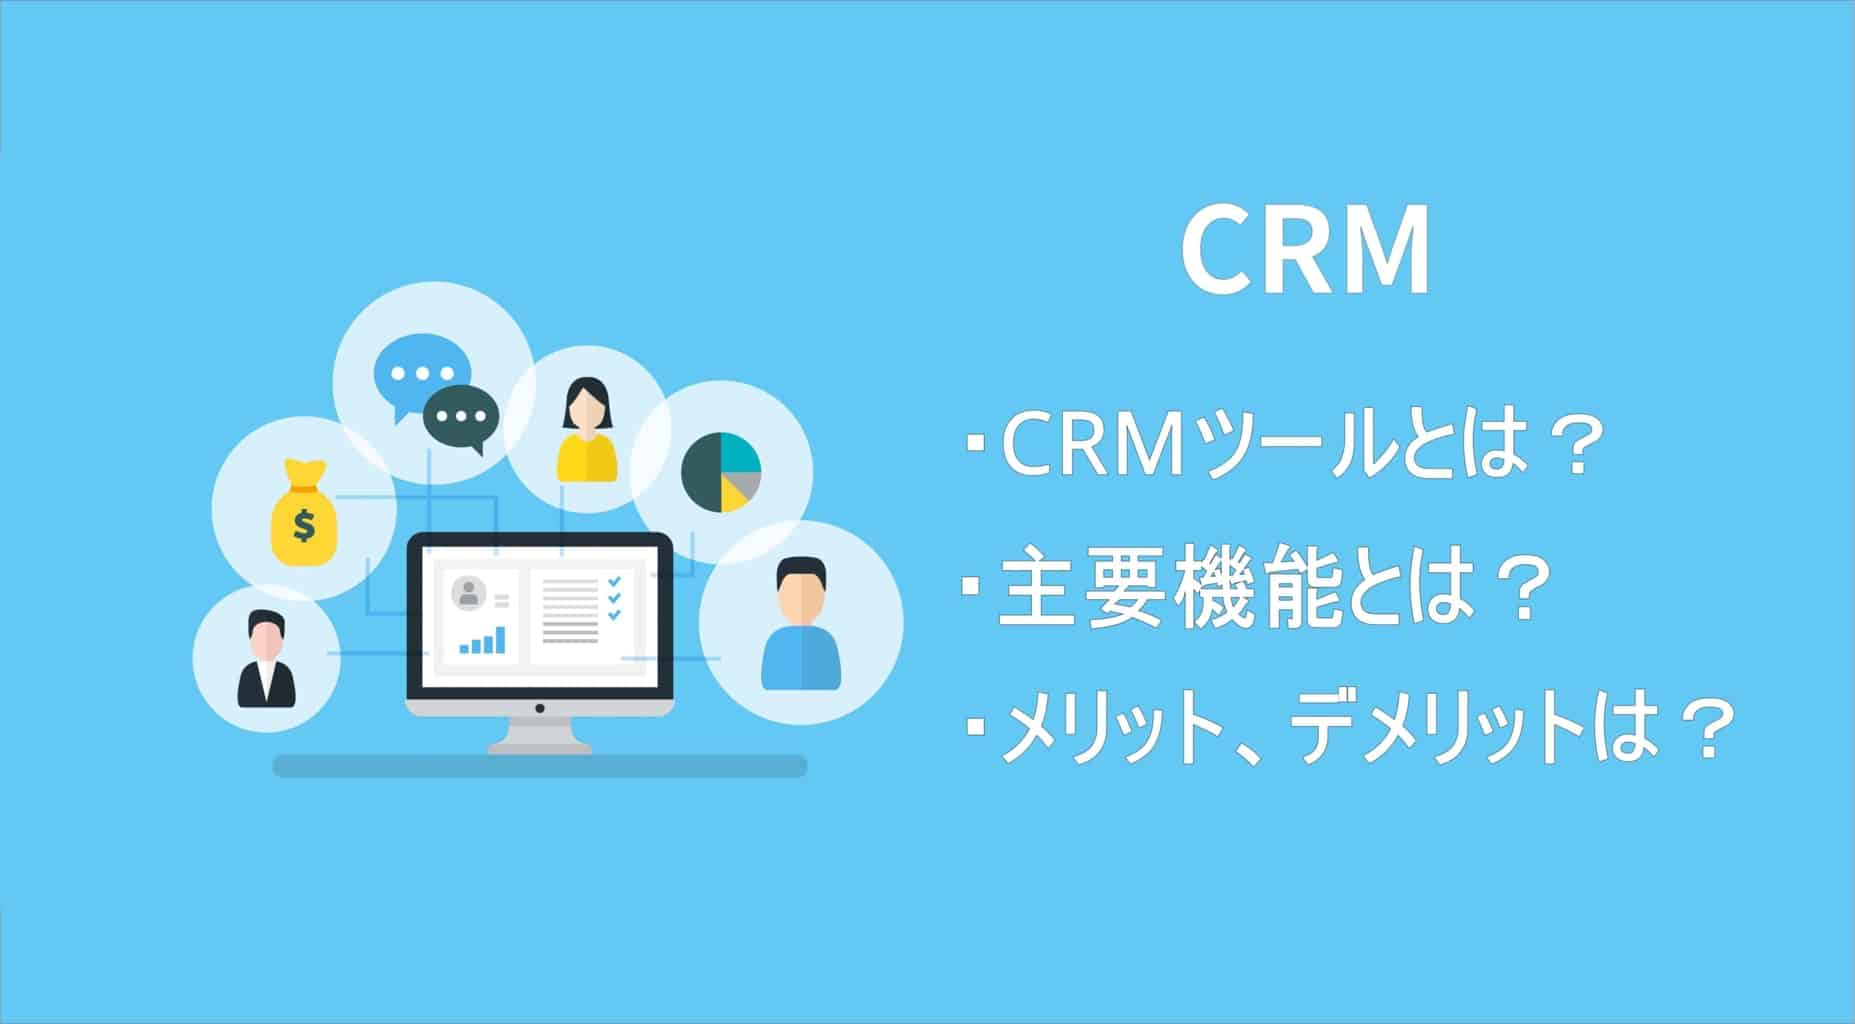 CRMツールとは?主要機能やメリット・デメリットも紹介!